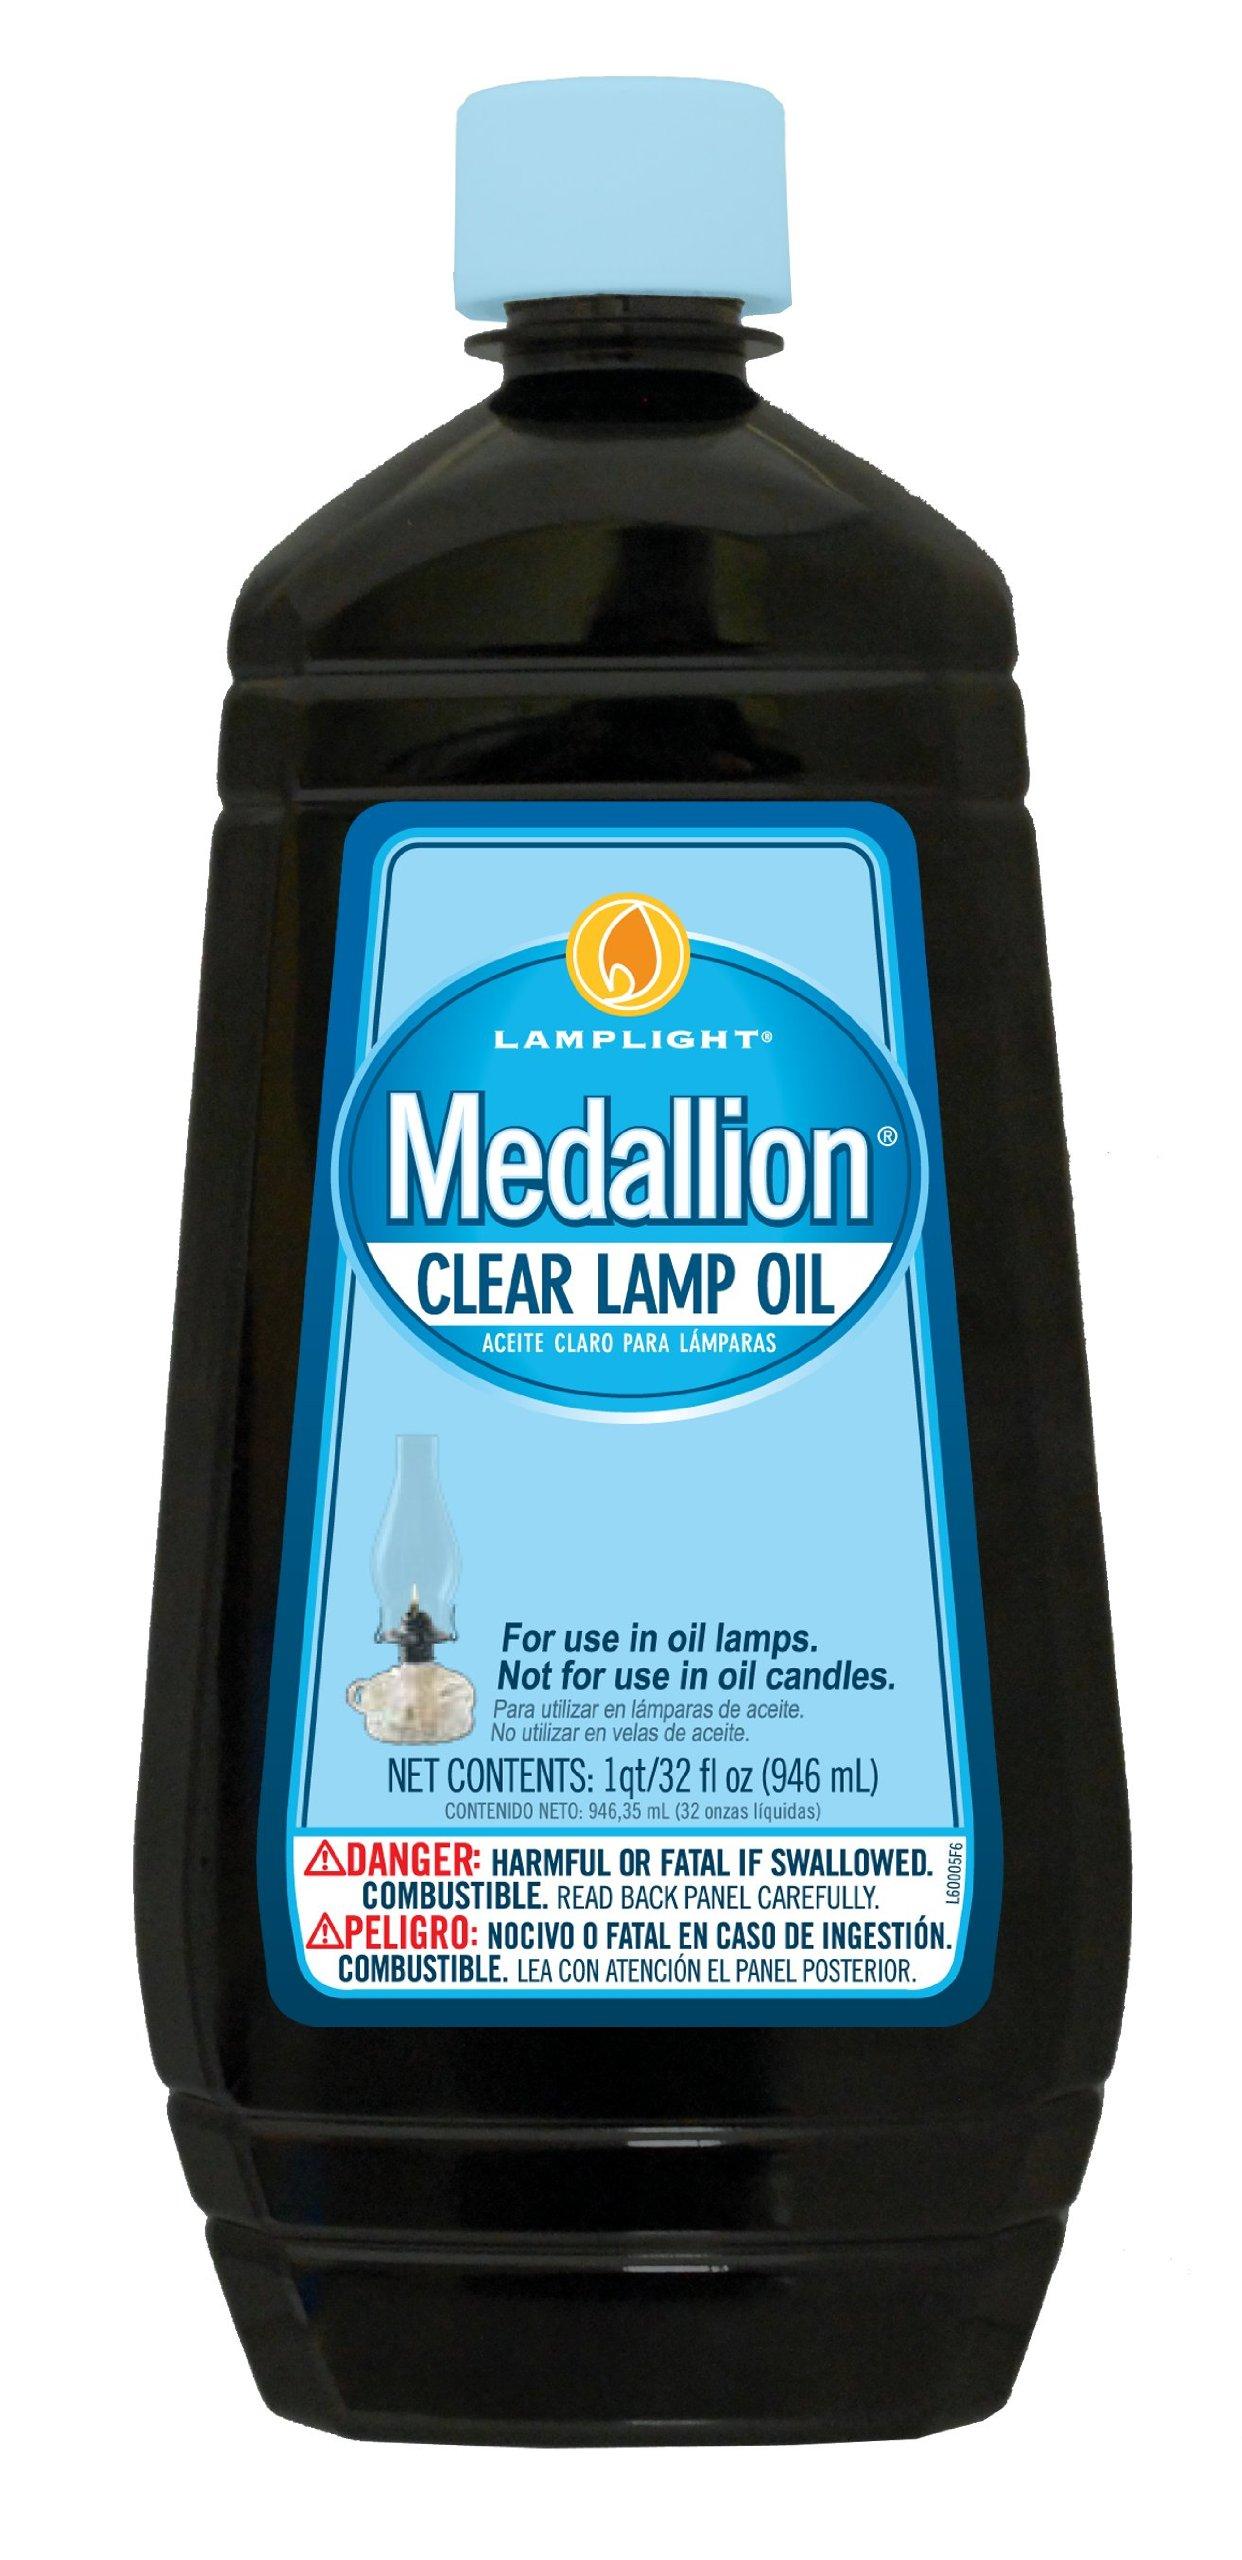 Lamplight Medallion Lamp Oil - 32oz by Lamplight